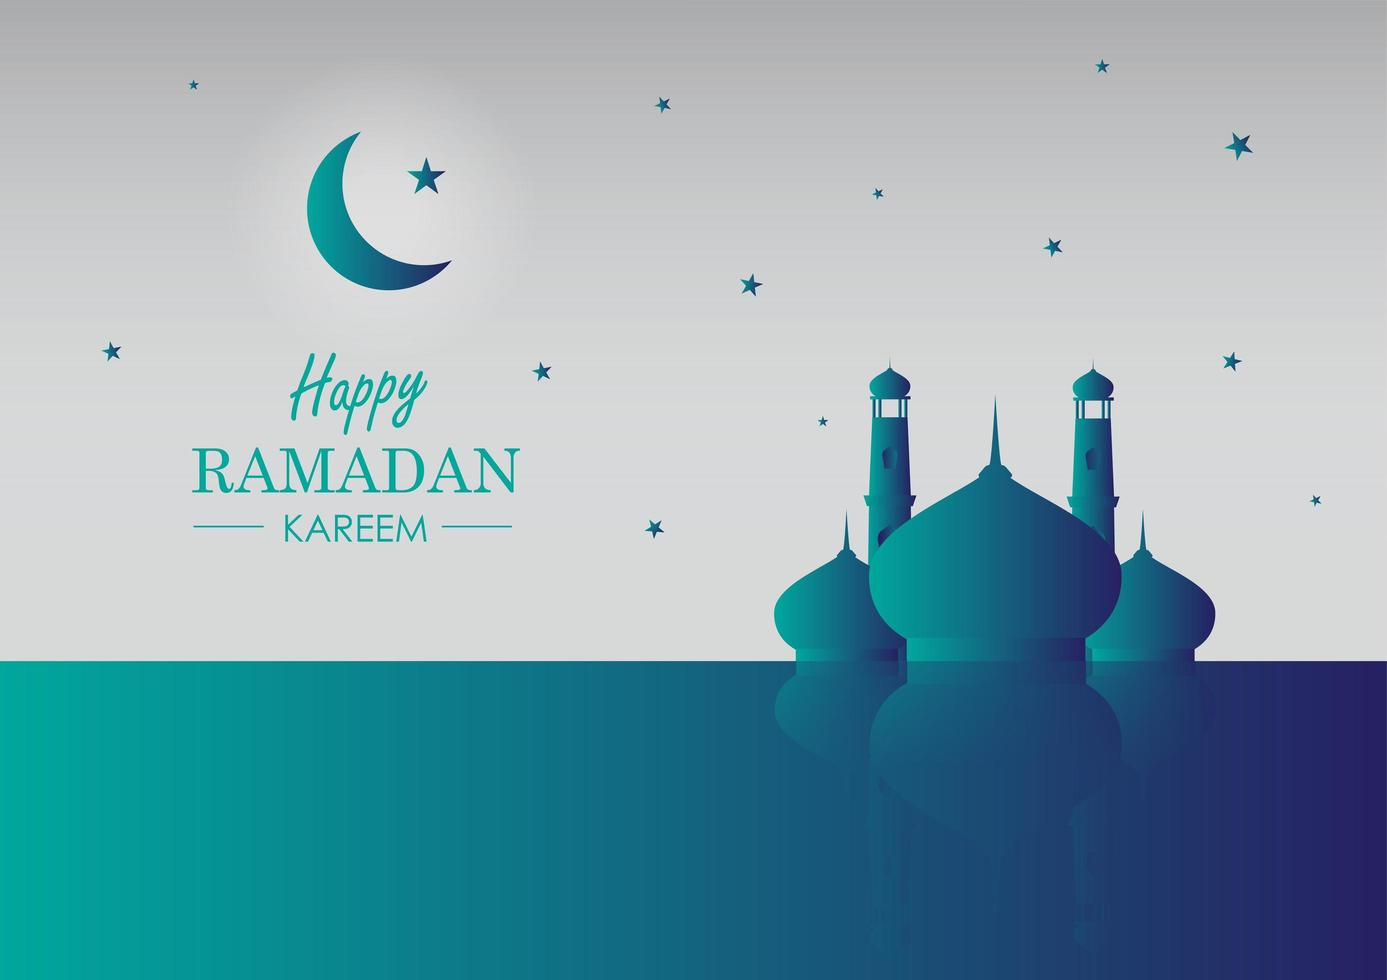 ramadan kareem moské reflektion kort vektor